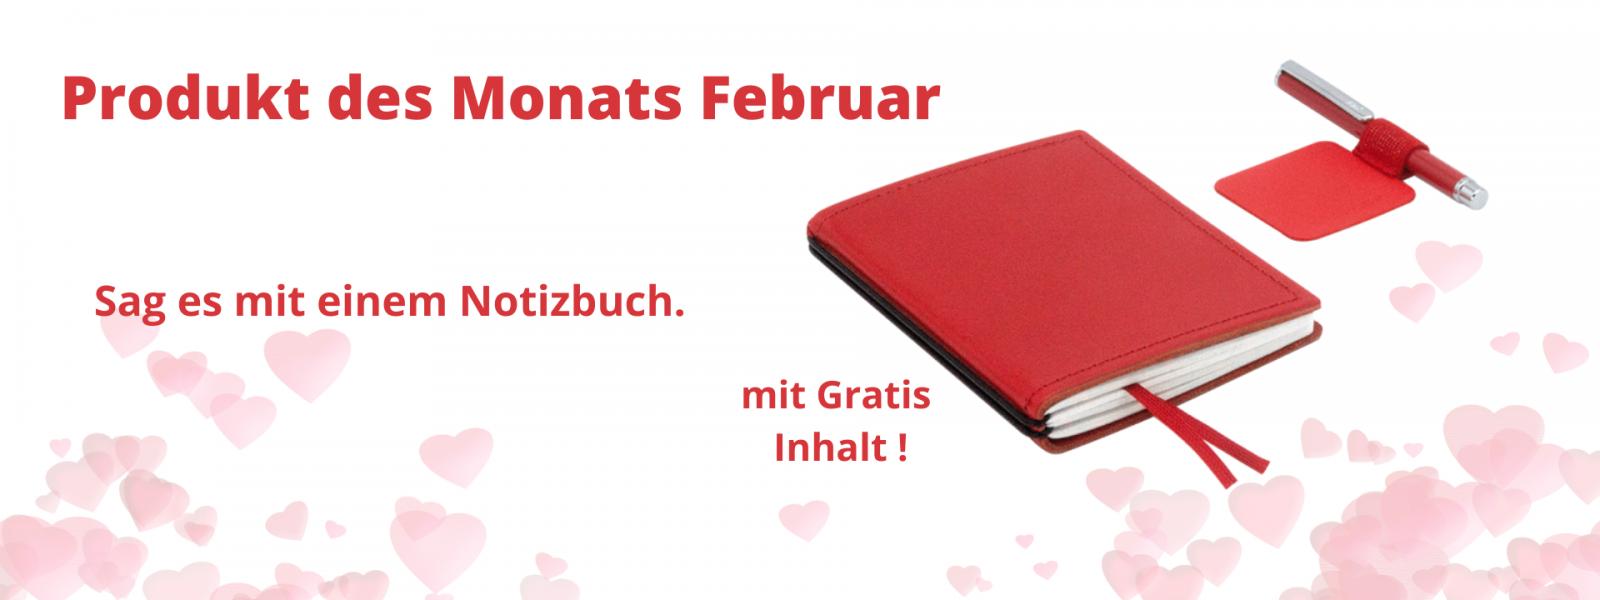 Produkt des Monats Februar